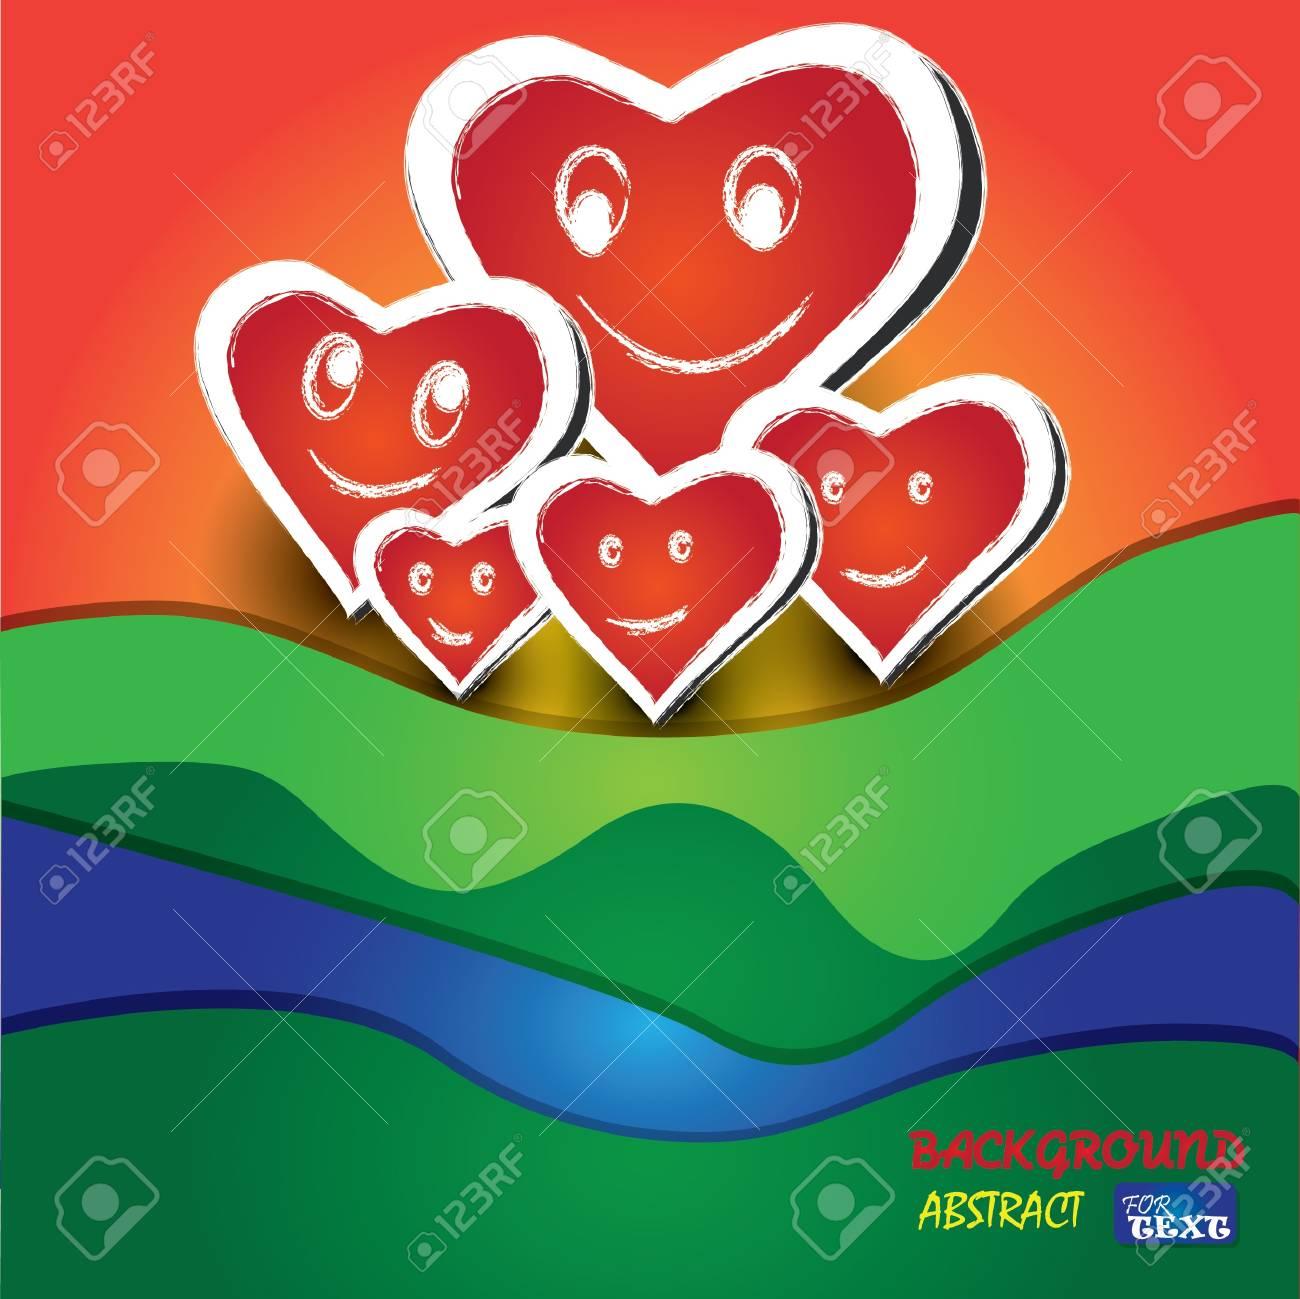 Hearts family,abstract Stock Vector - 18521846